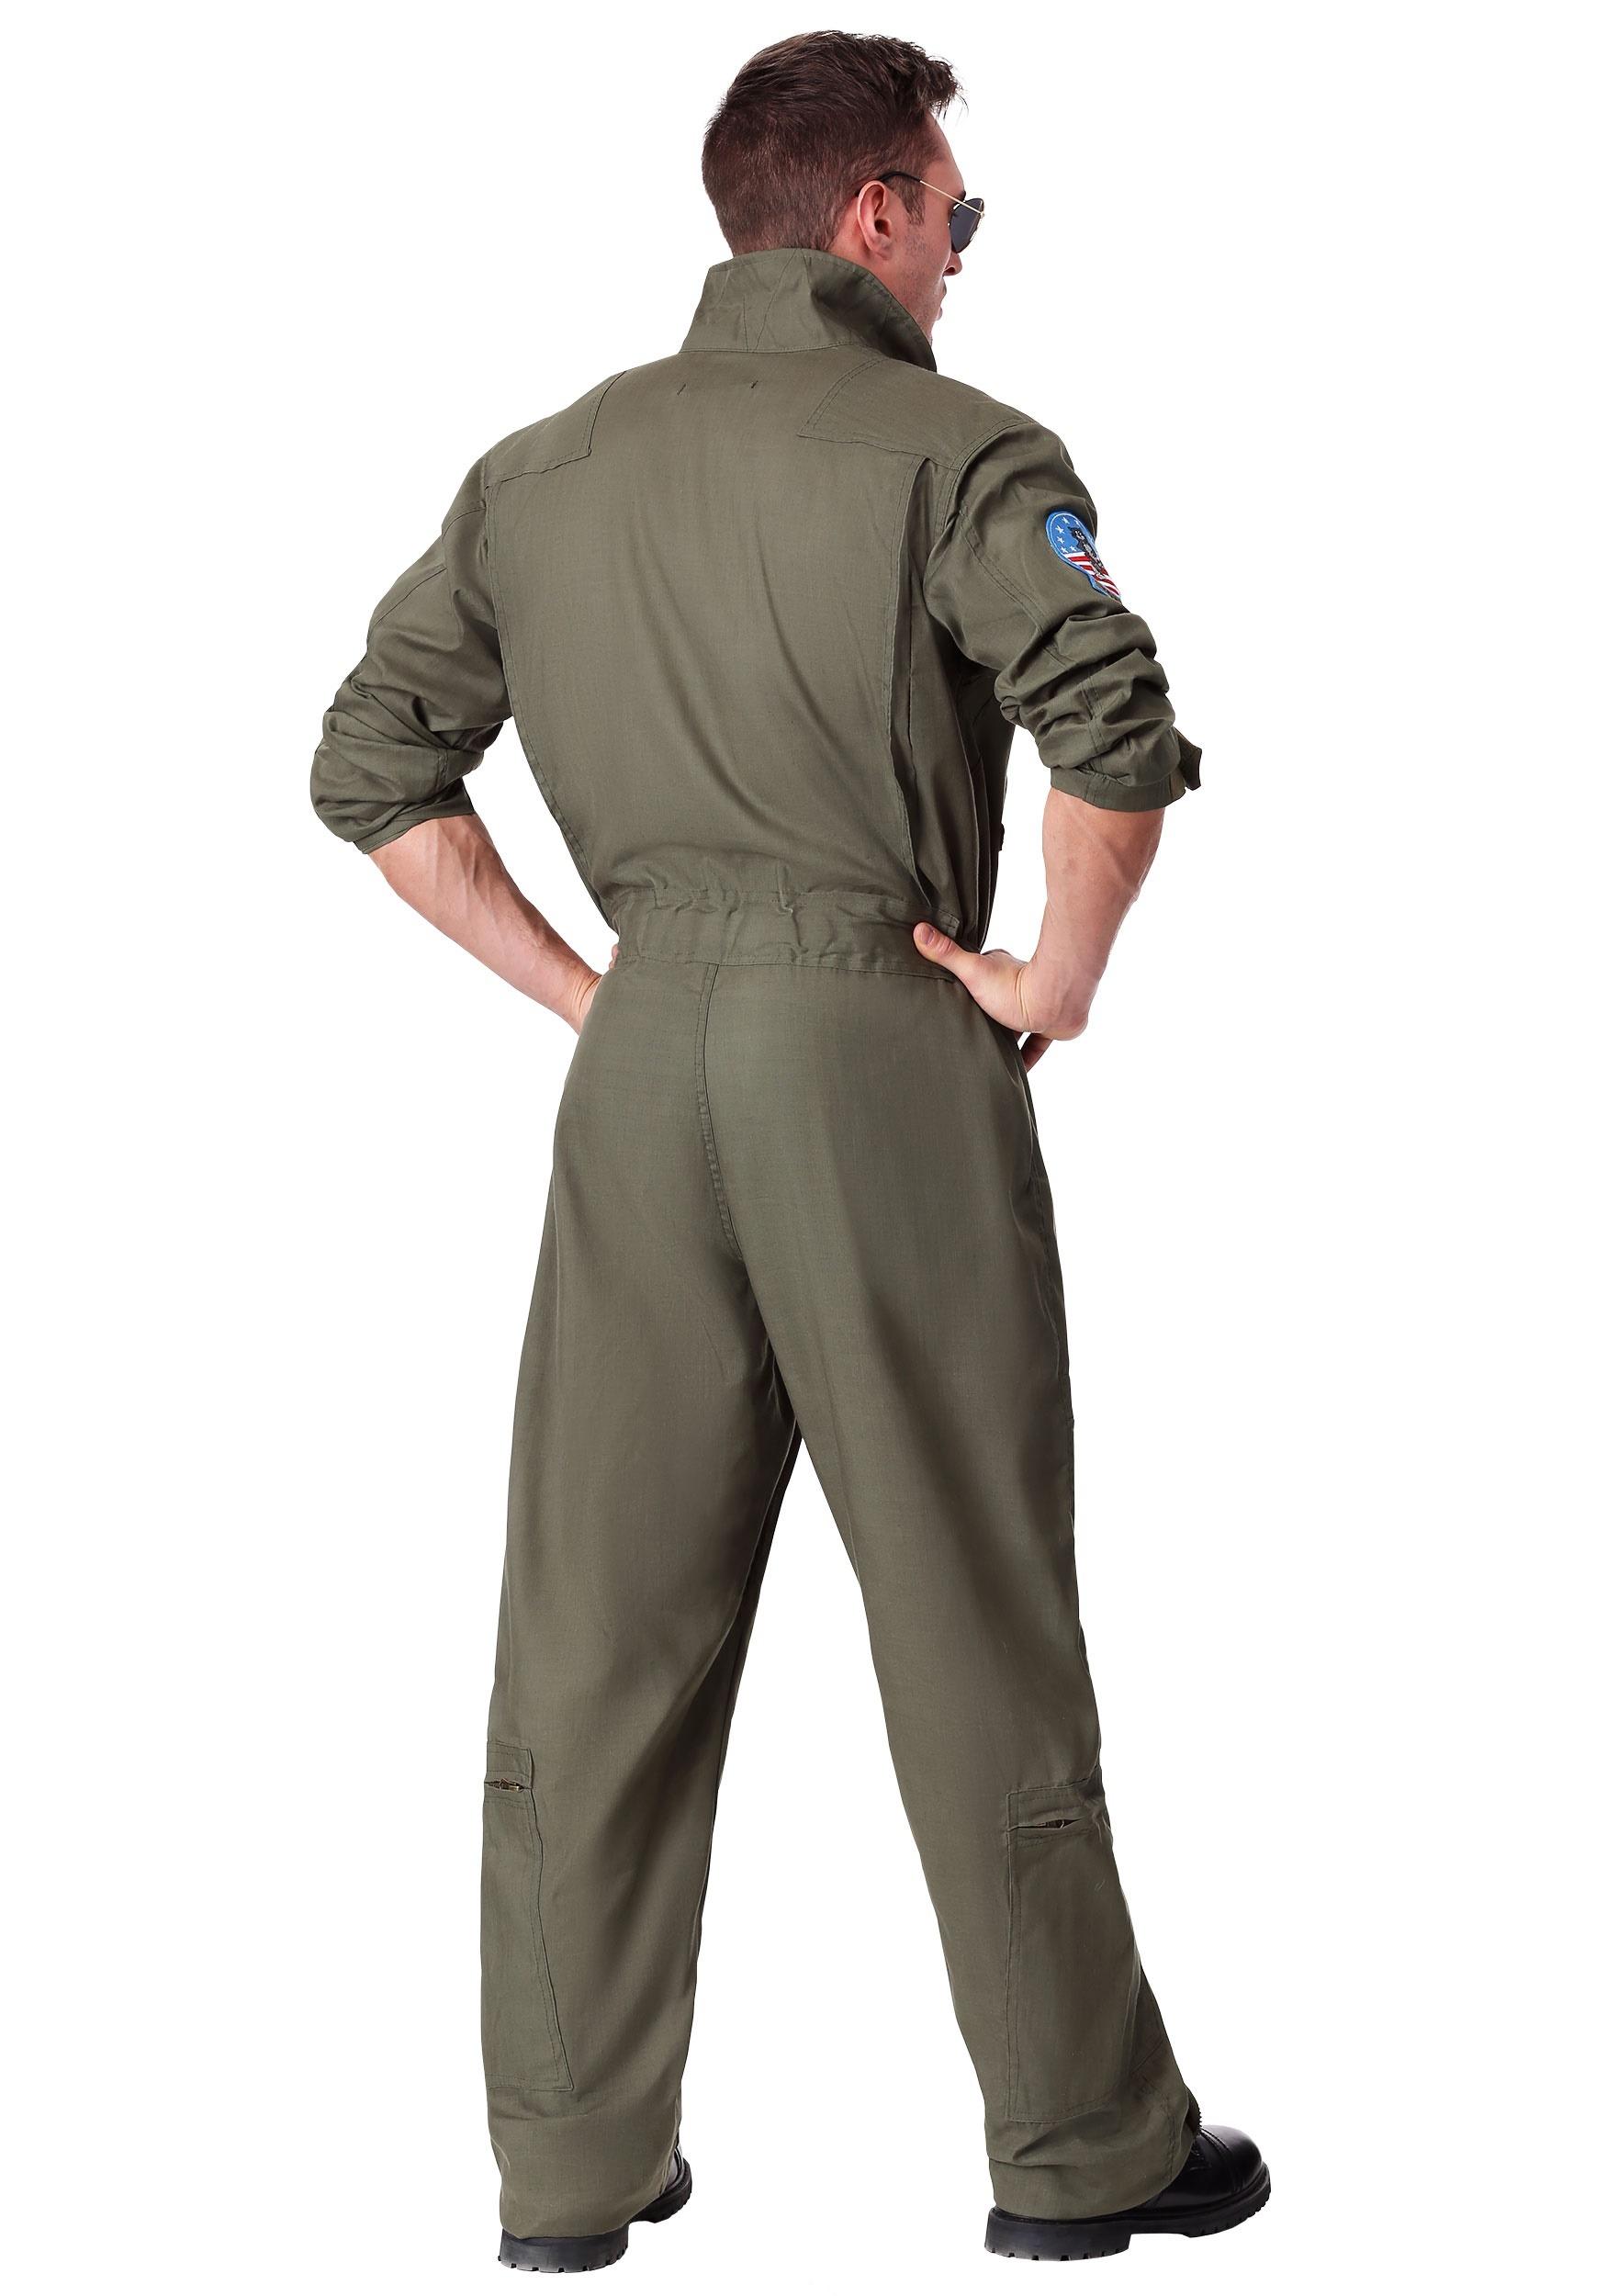 cde747db4f5b Mens top gun flight suit costume jpg 1750x2500 Air force flight suit rentals